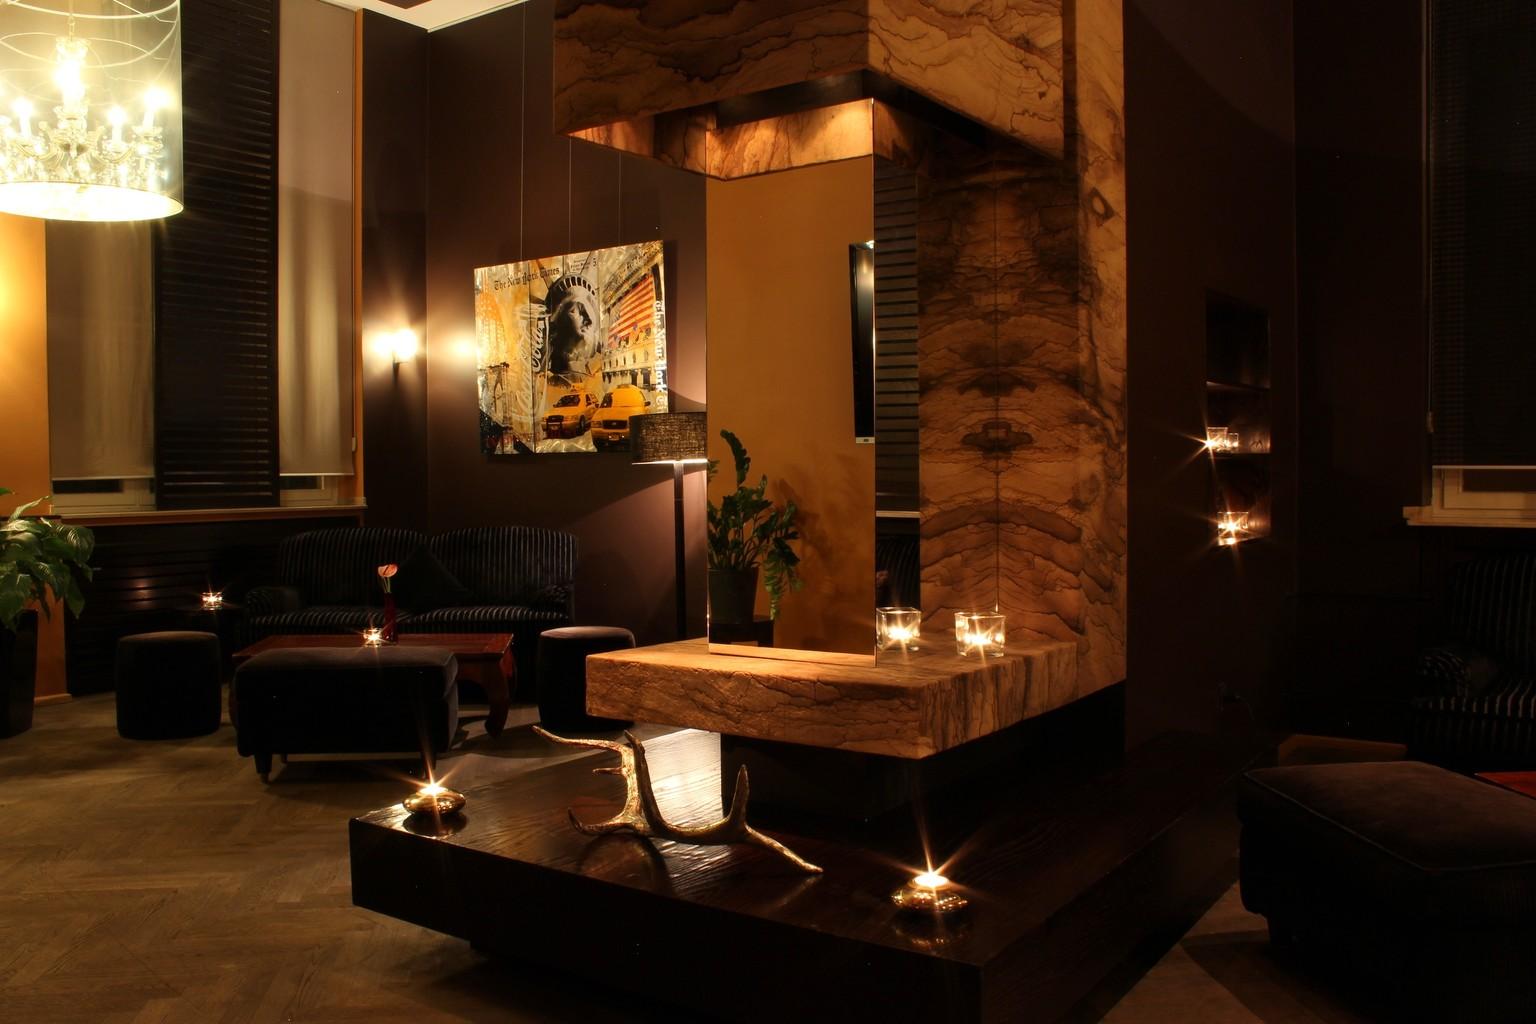 Kameha Lounge Kaminzimmerabend